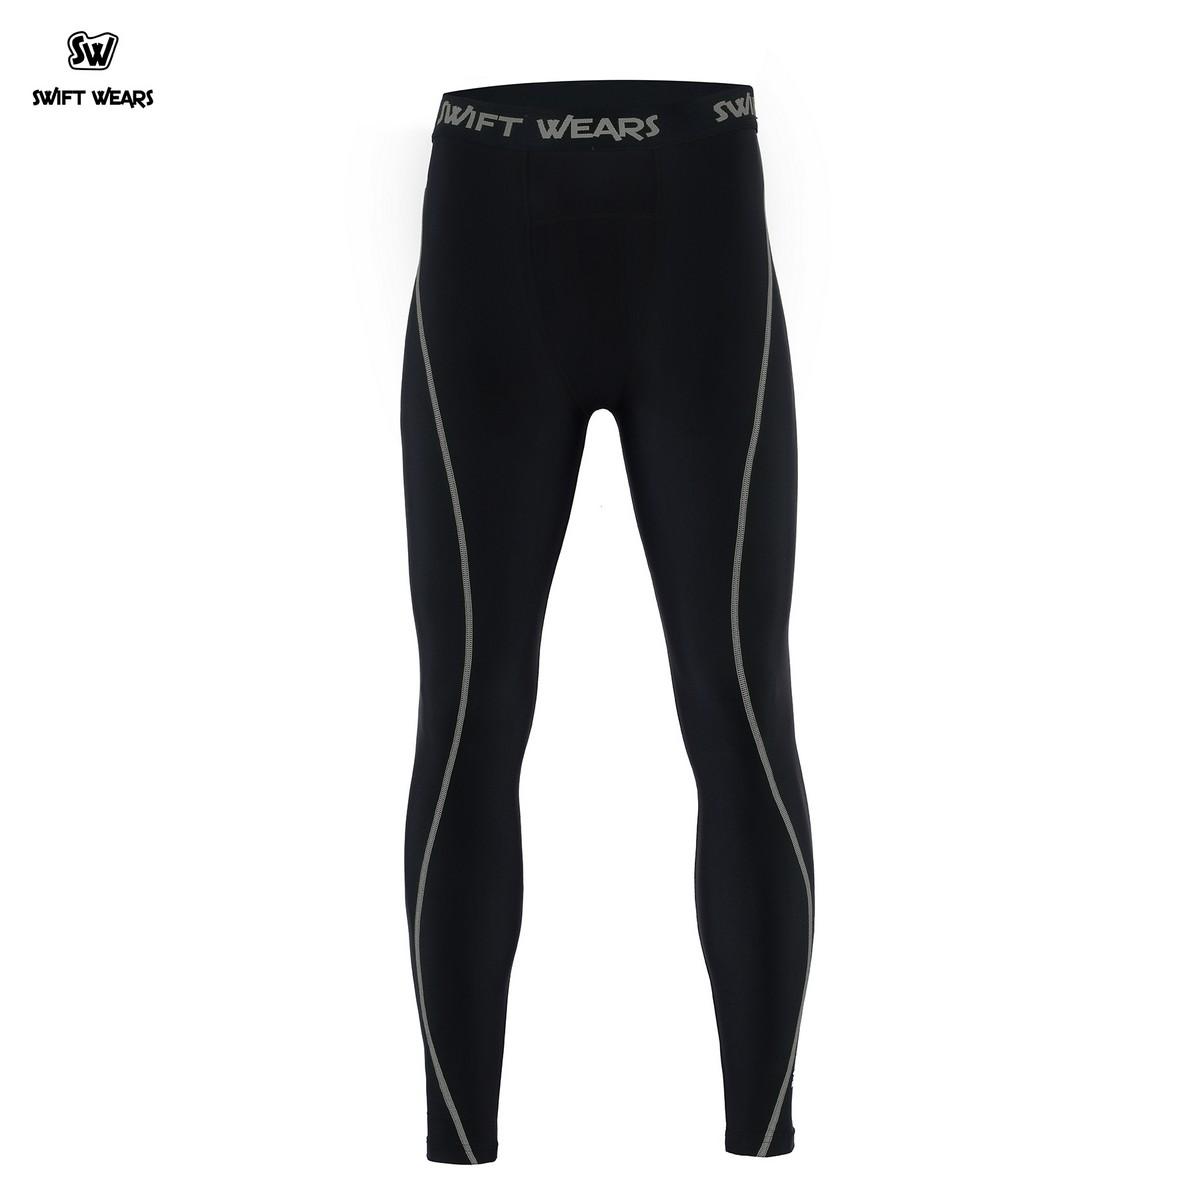 Swift Wears Men's Gym Fitness Yoga Compression Wear Pant Leggings